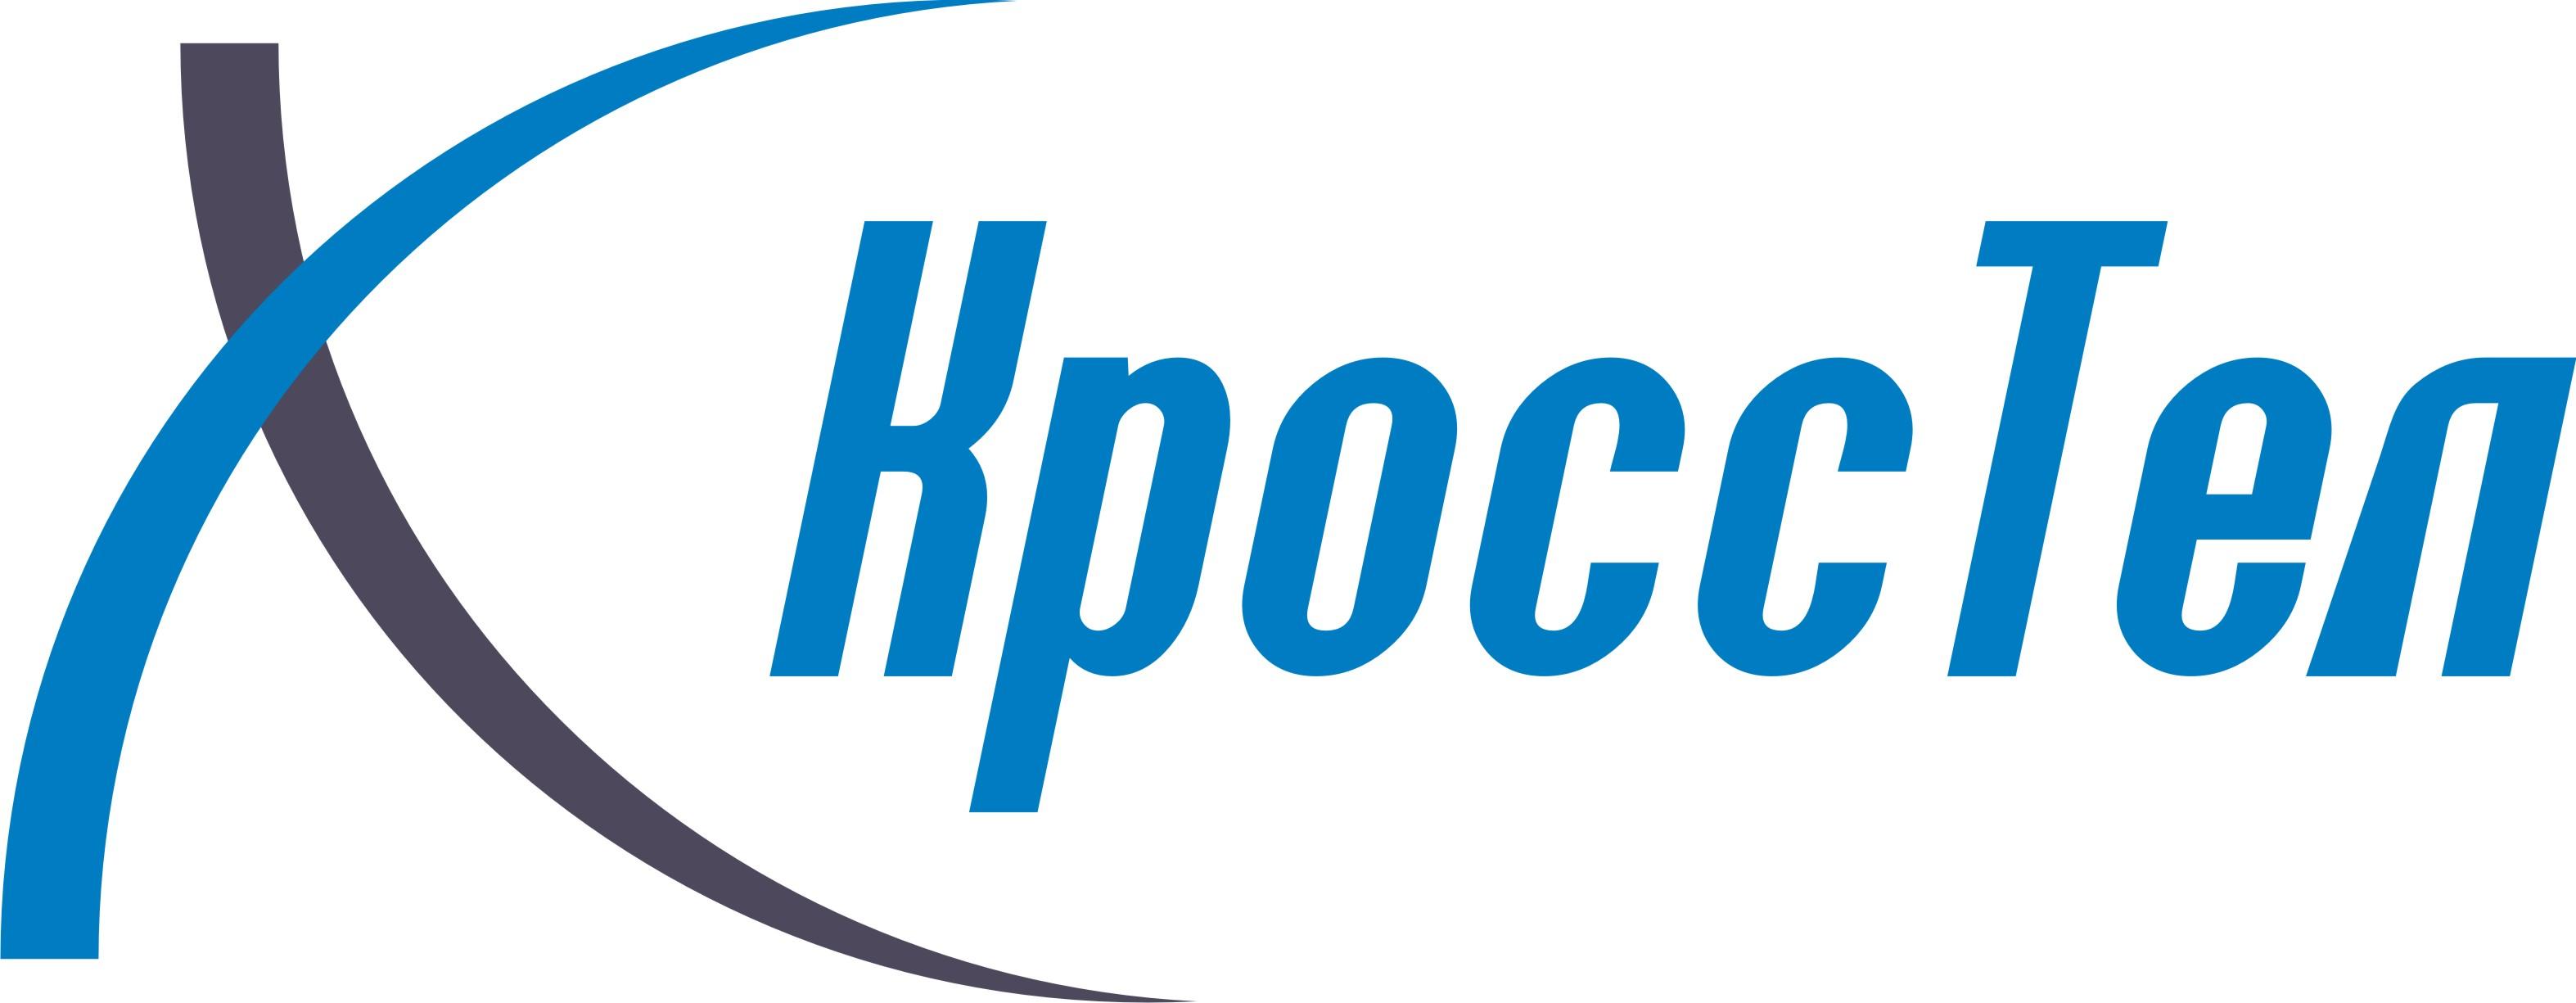 Логотип для компании оператора связи фото f_4ed55a9de1fa1.jpg